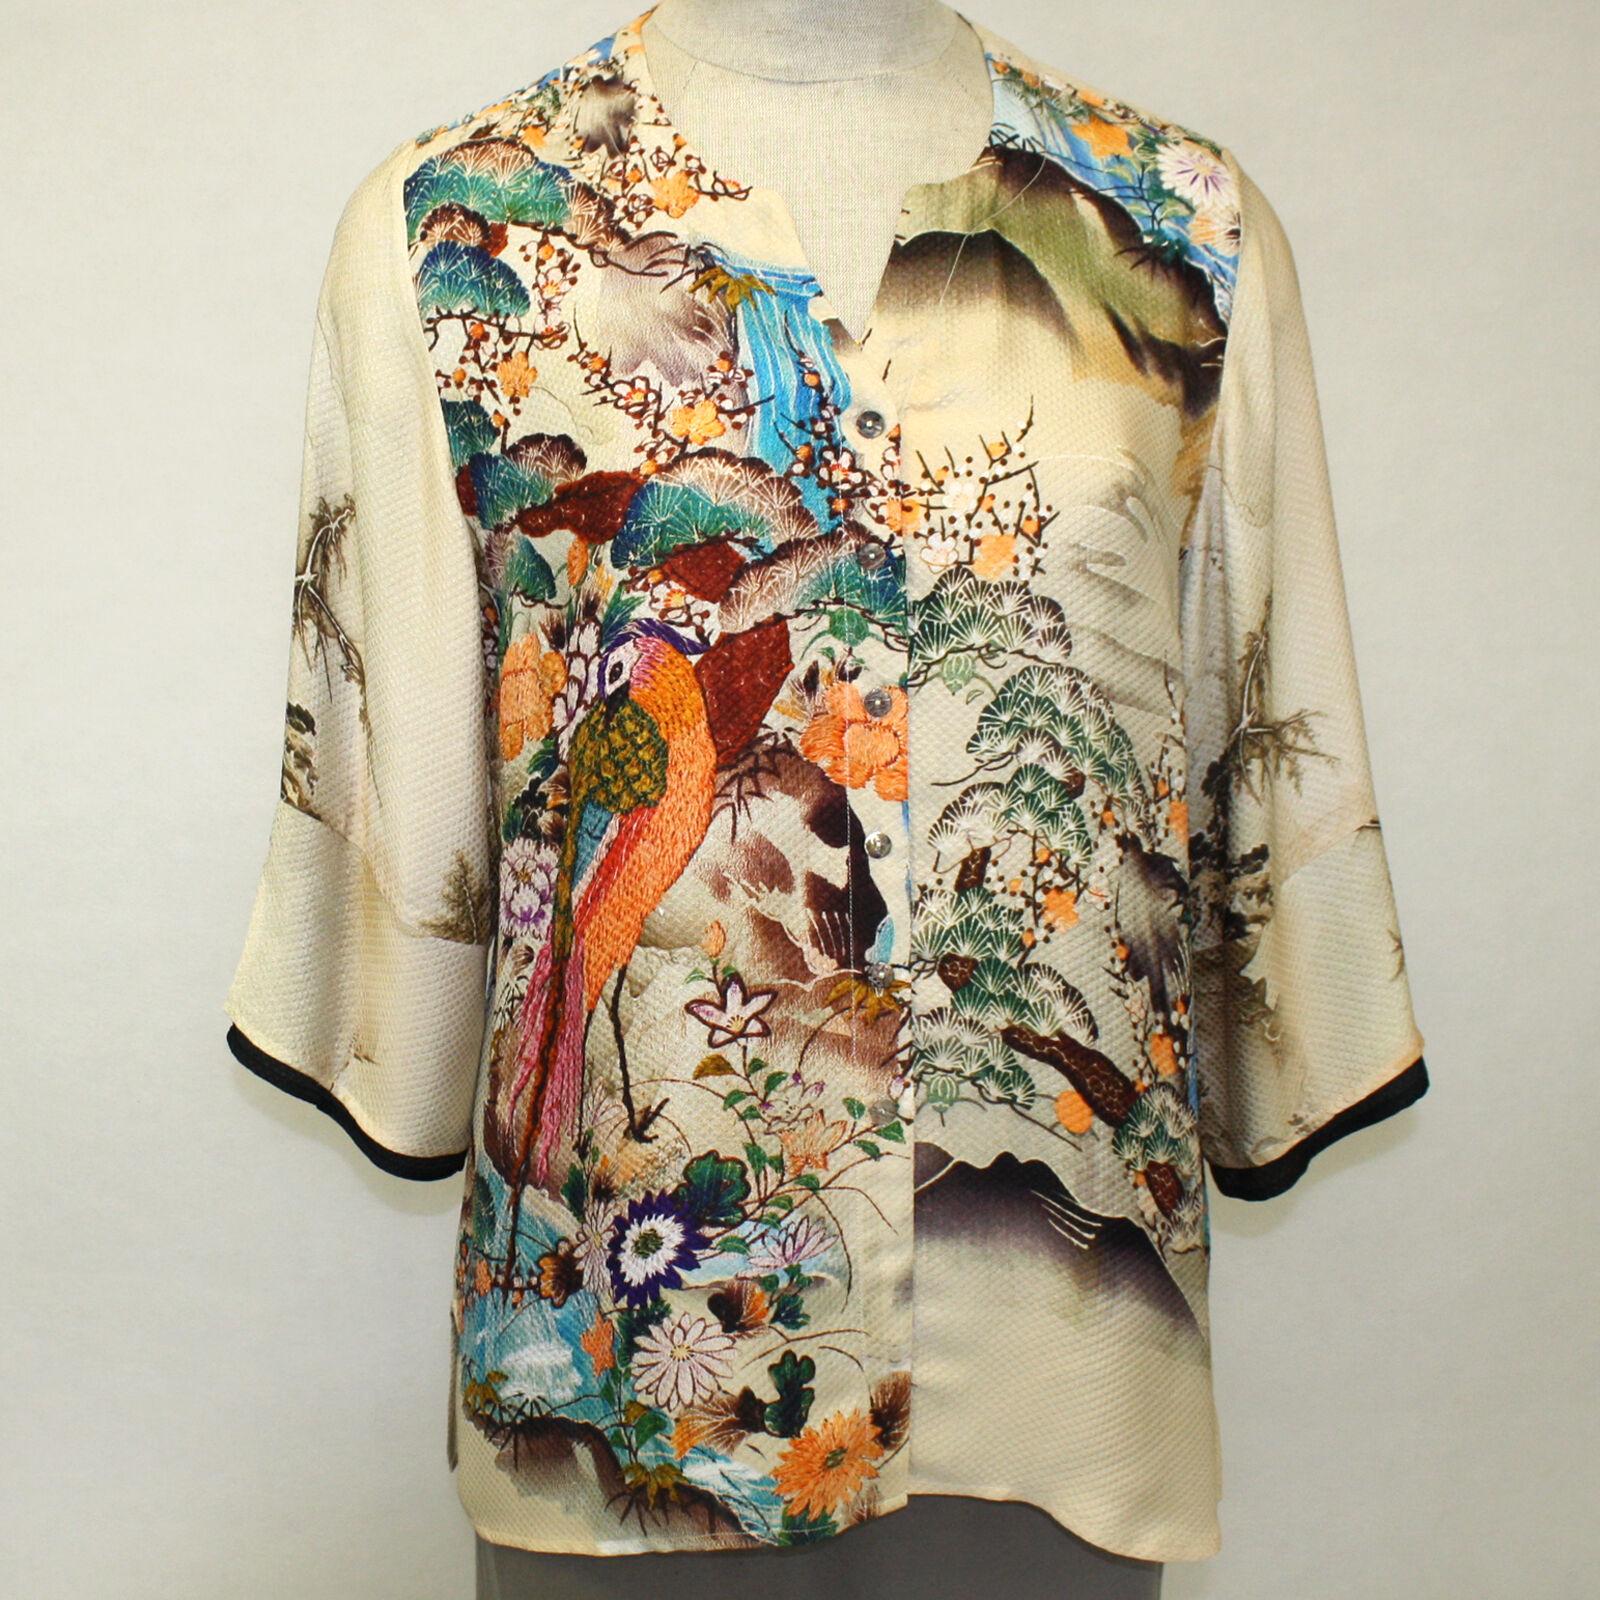 Citron Clothing 100% Silk Art To Wear Birds Paradise Fukure Art Blouse Plus 2X